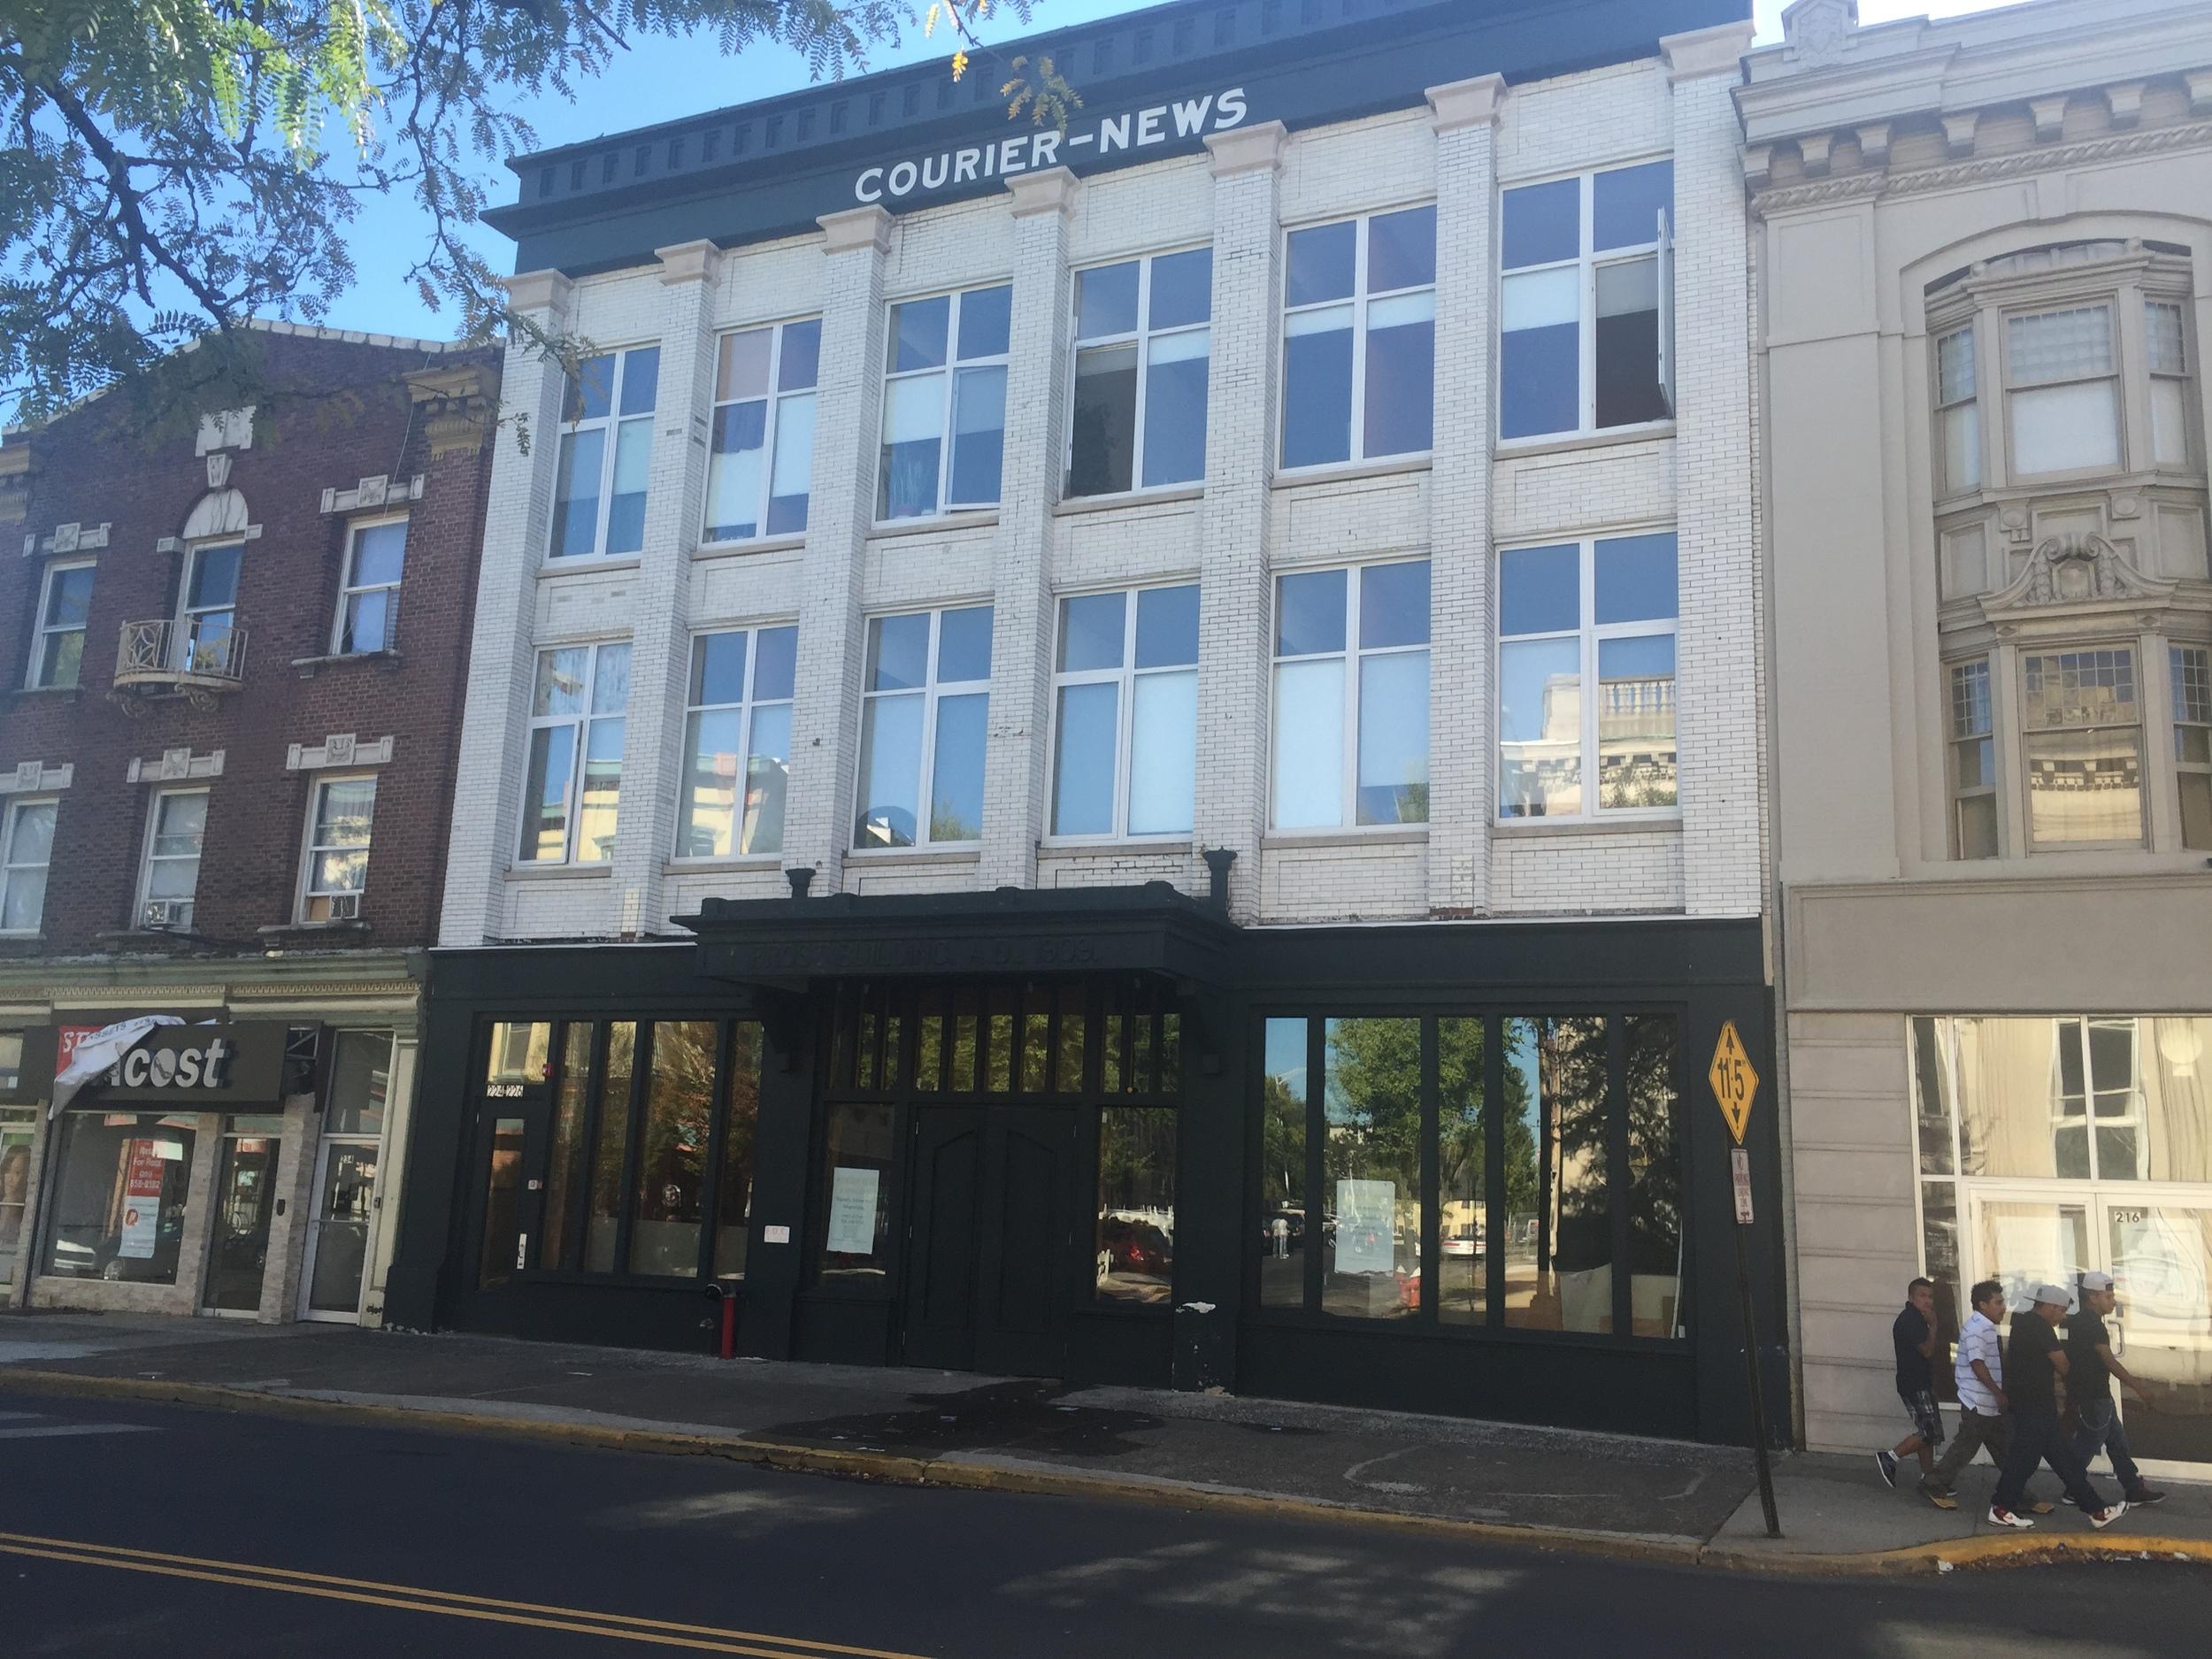 The Courier-News/Frost Building |234-238 Park Avenue | Built 1896 |Late 19th Century Commercial Building